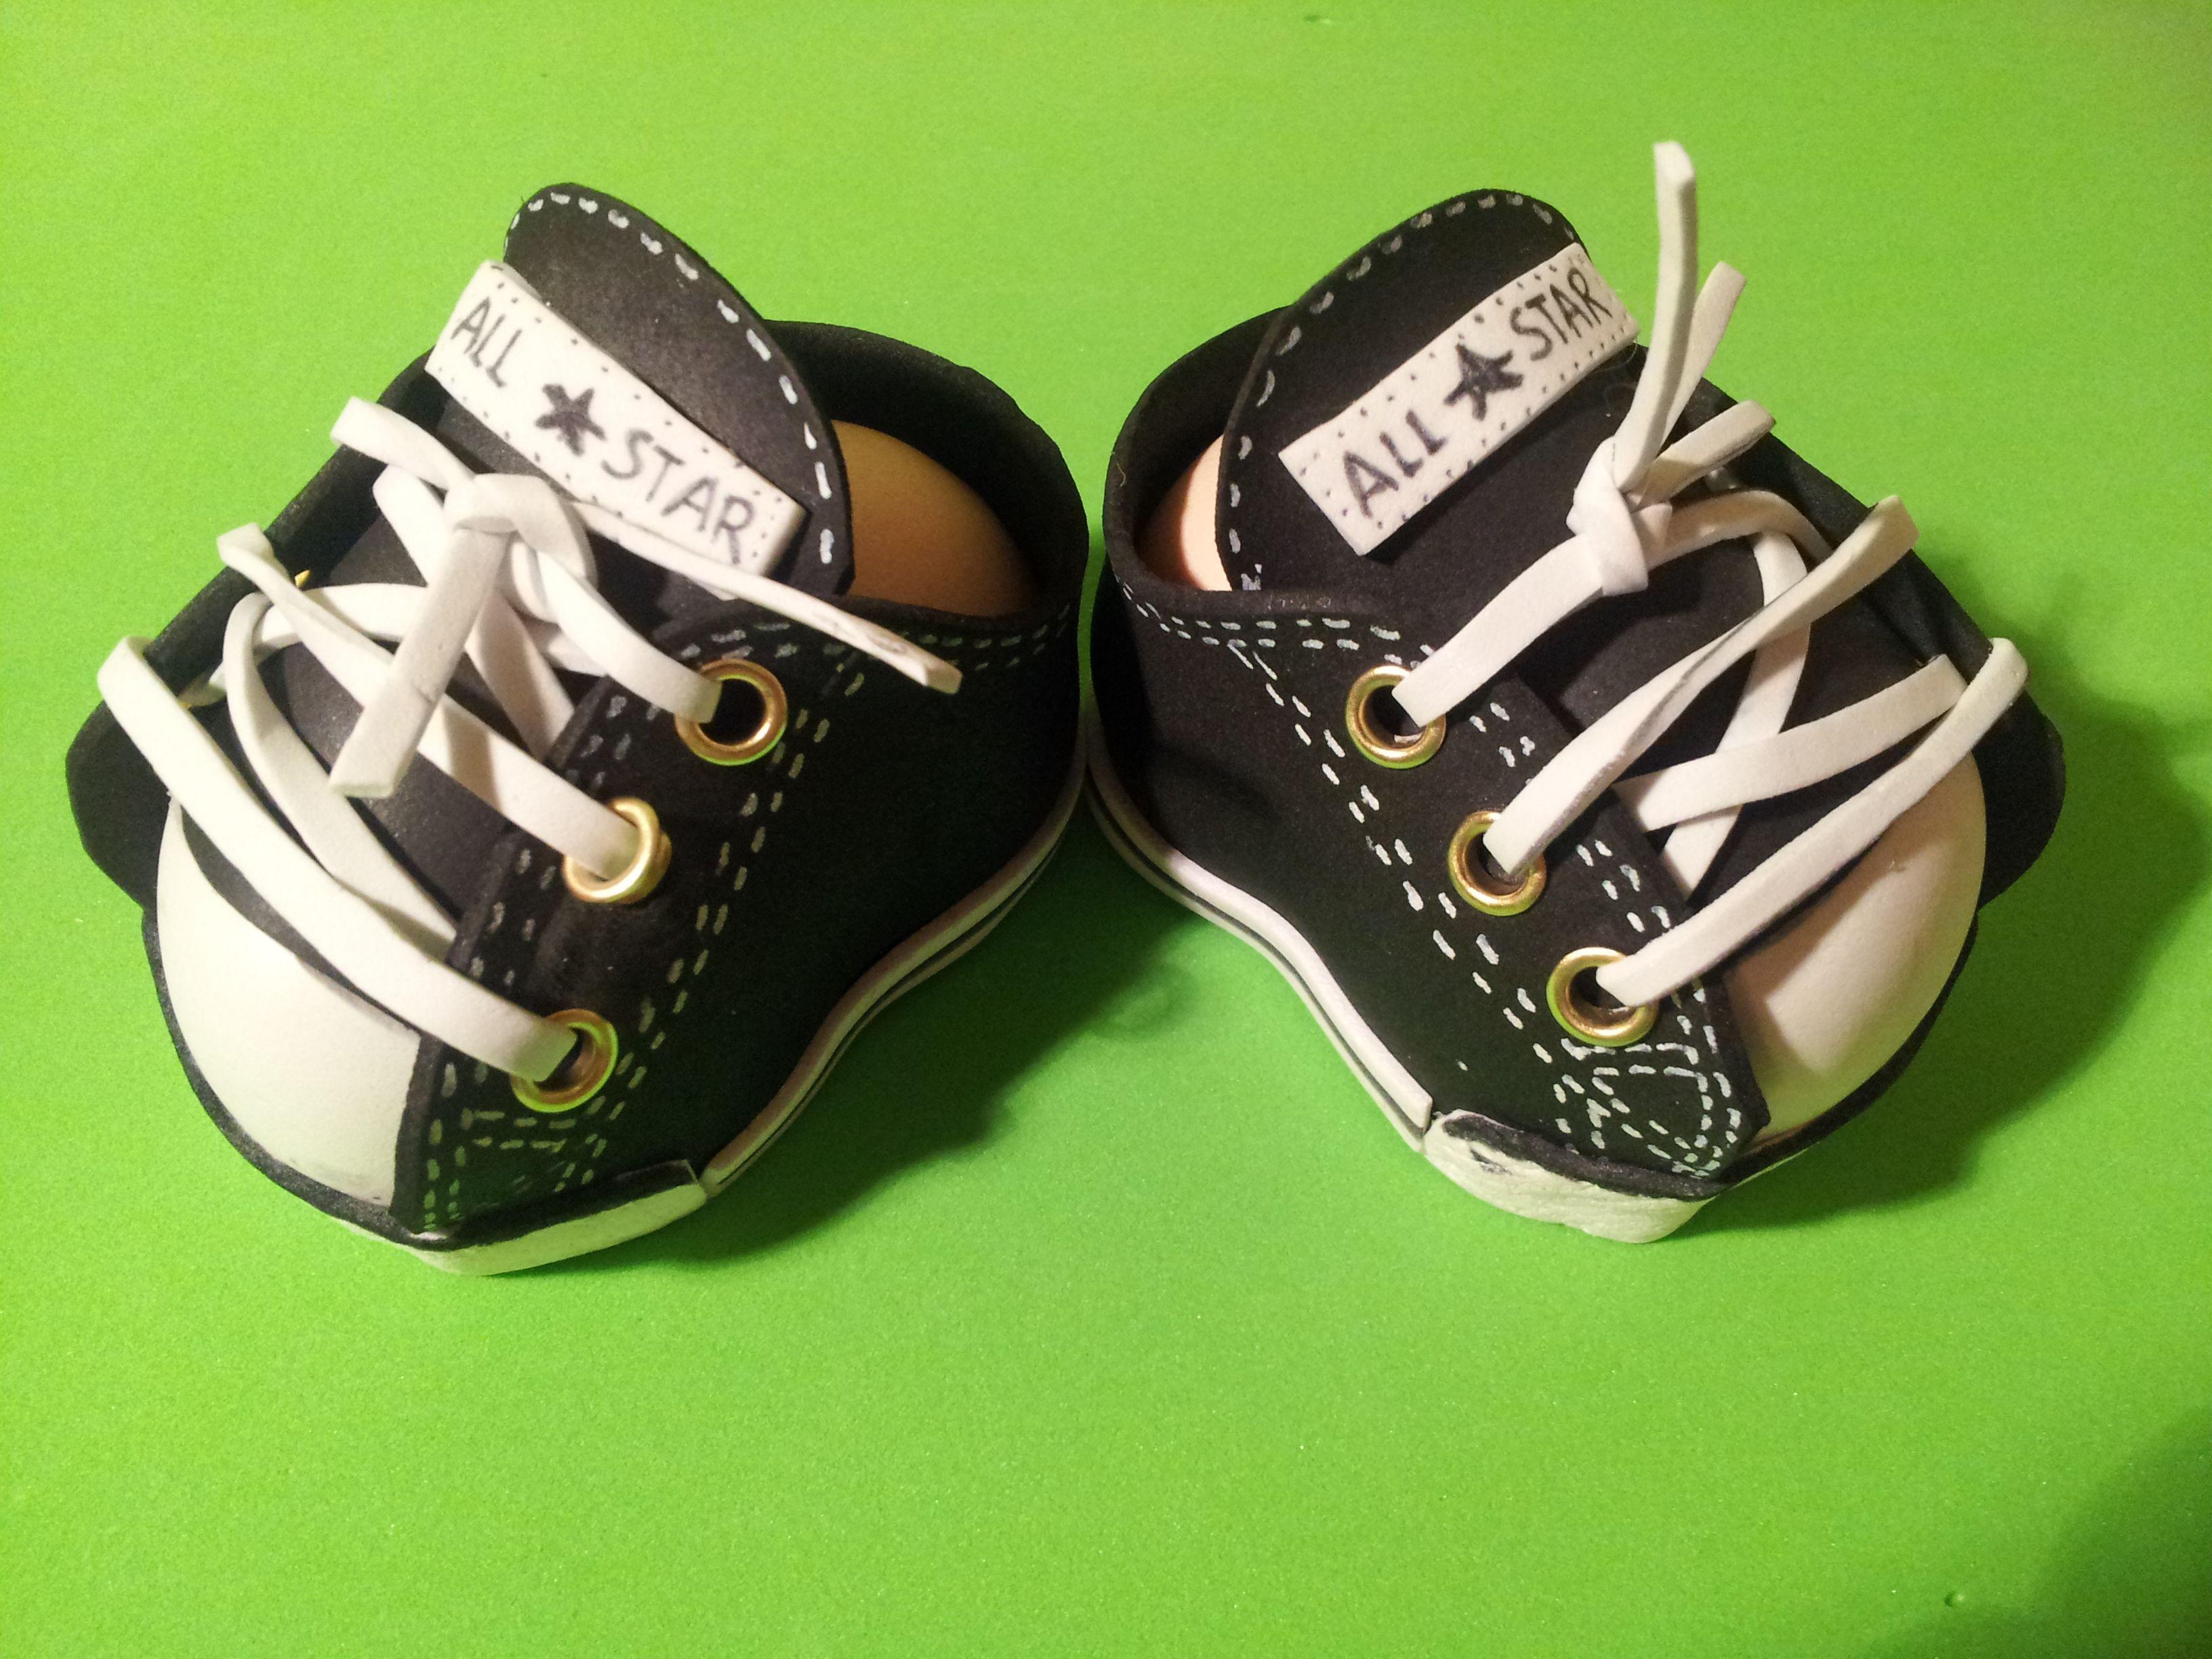 Zapatos para fofucha. Zapatilla converse. | gomma crepla